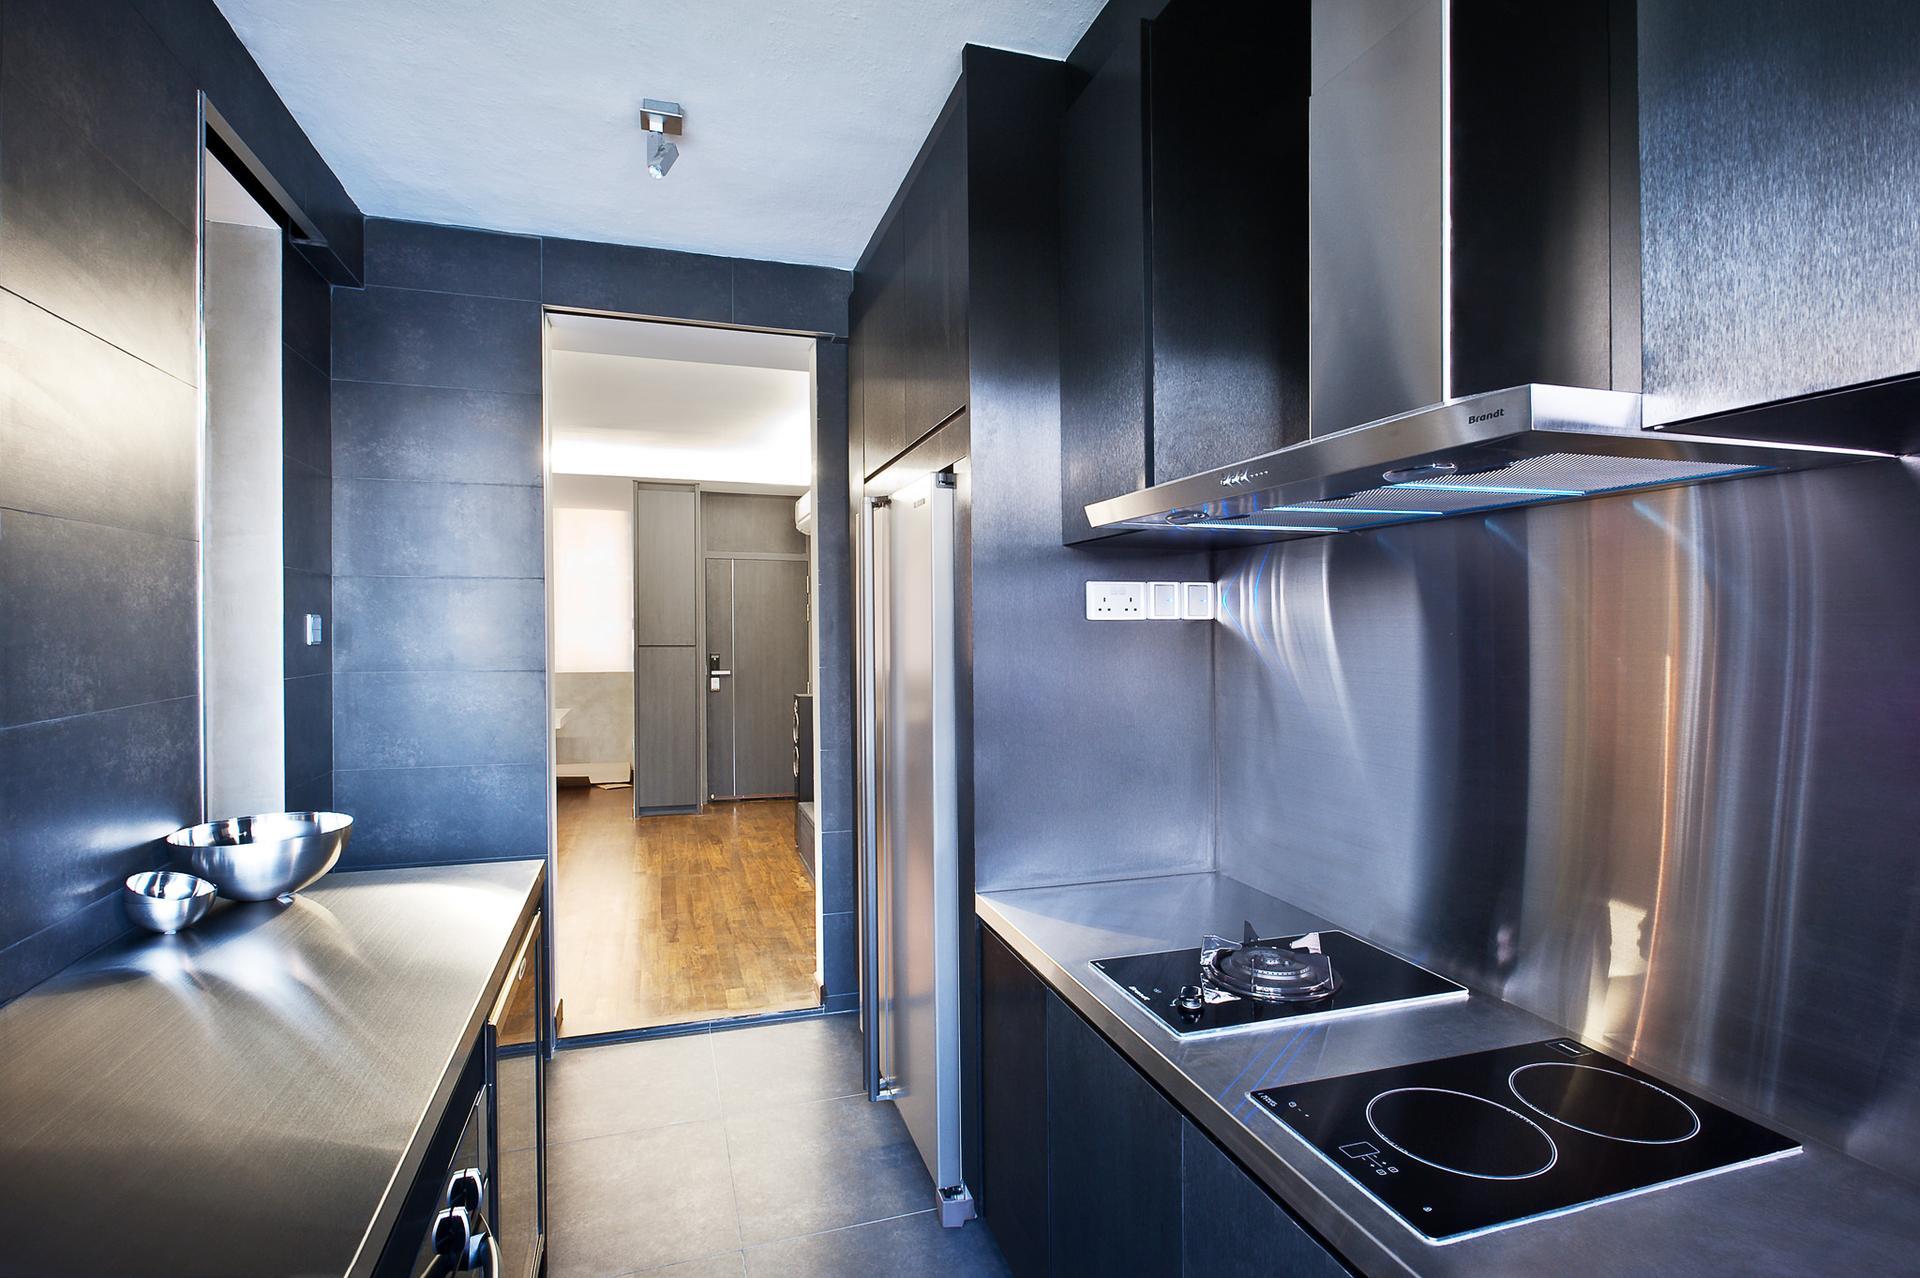 Однокомнатная квартира в стиле хай тек с кухней